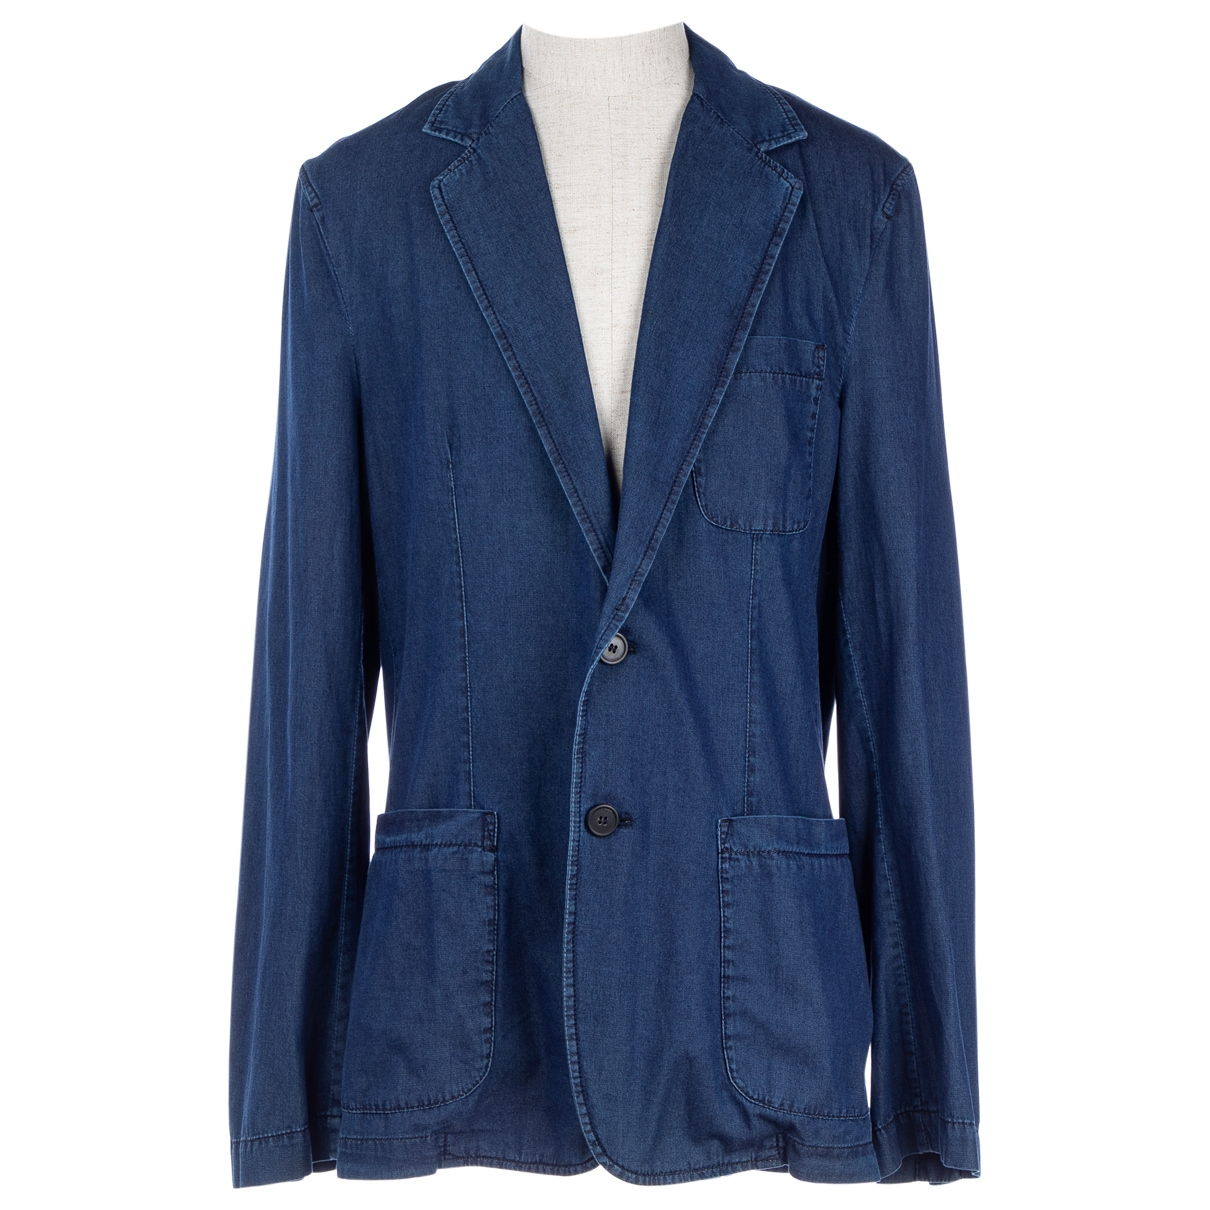 Lanvin \N Jacke in  Blau Denim - Jeans